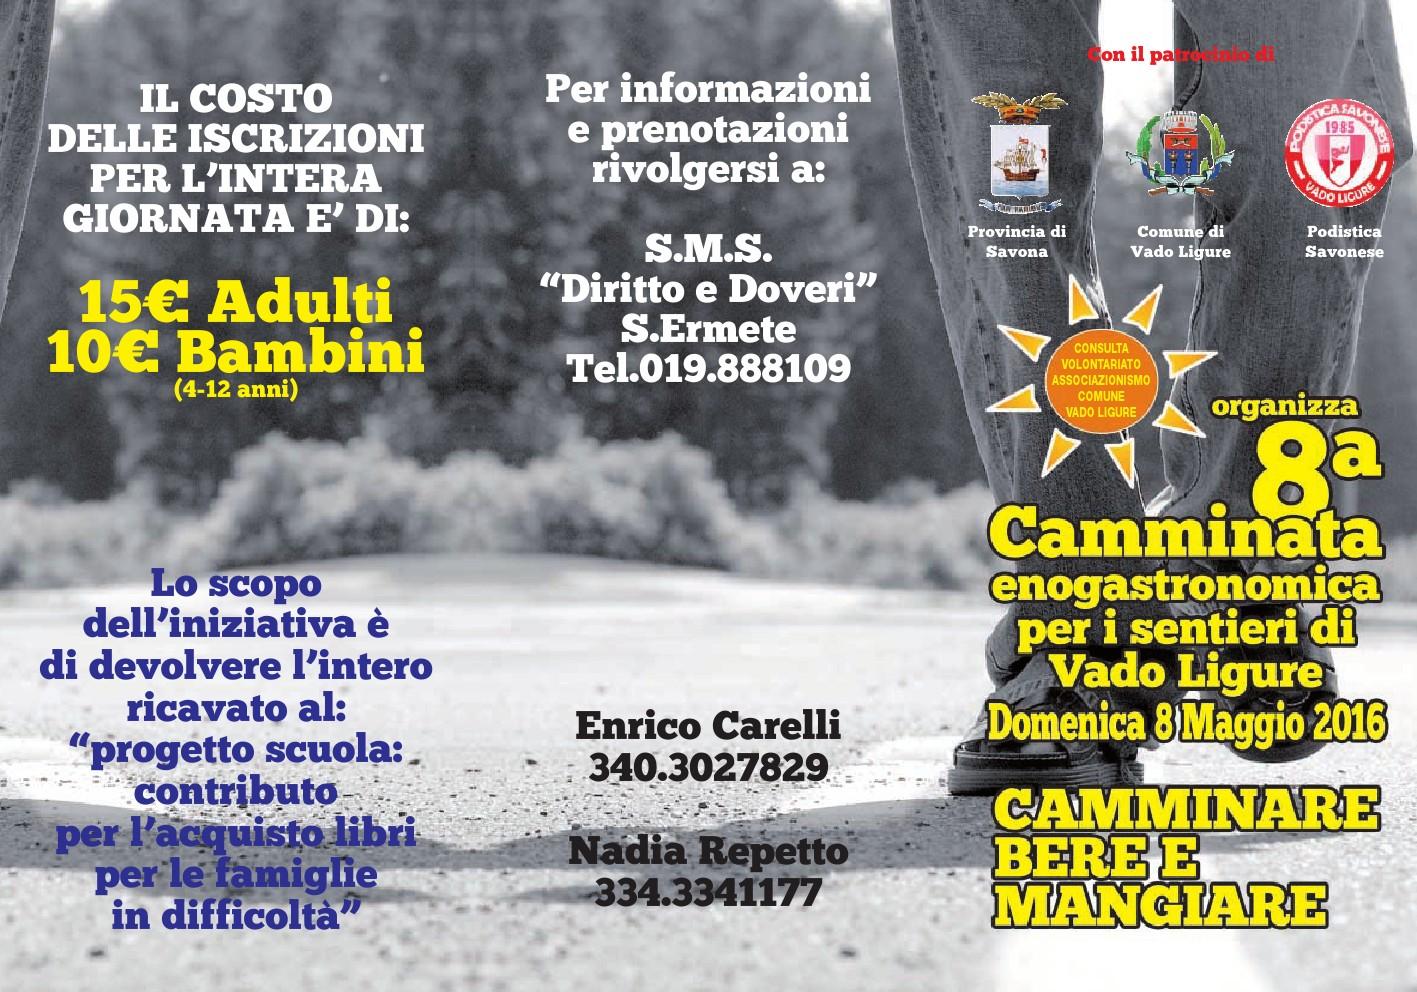 Sant' Ermete (Vado Ligure)-Camminata enogastronomica